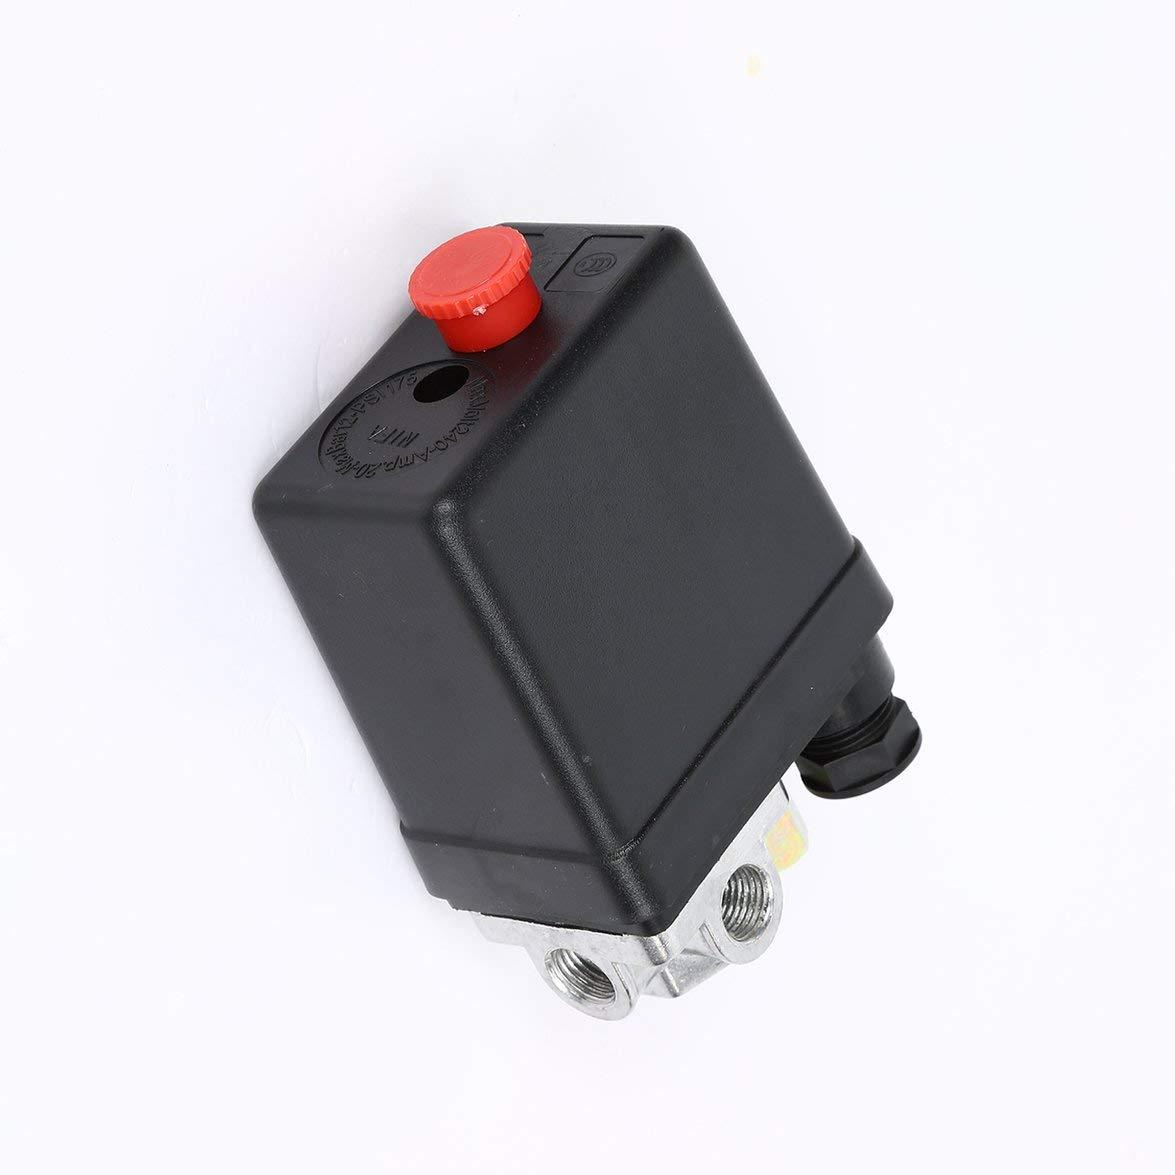 120 PSI Kongqiabona Heavy Duty 240V 16A Control autom/ático Auto Carga//Descarga Compresor de Aire Interruptor de presi/ón V/álvula de Control 90 PSI